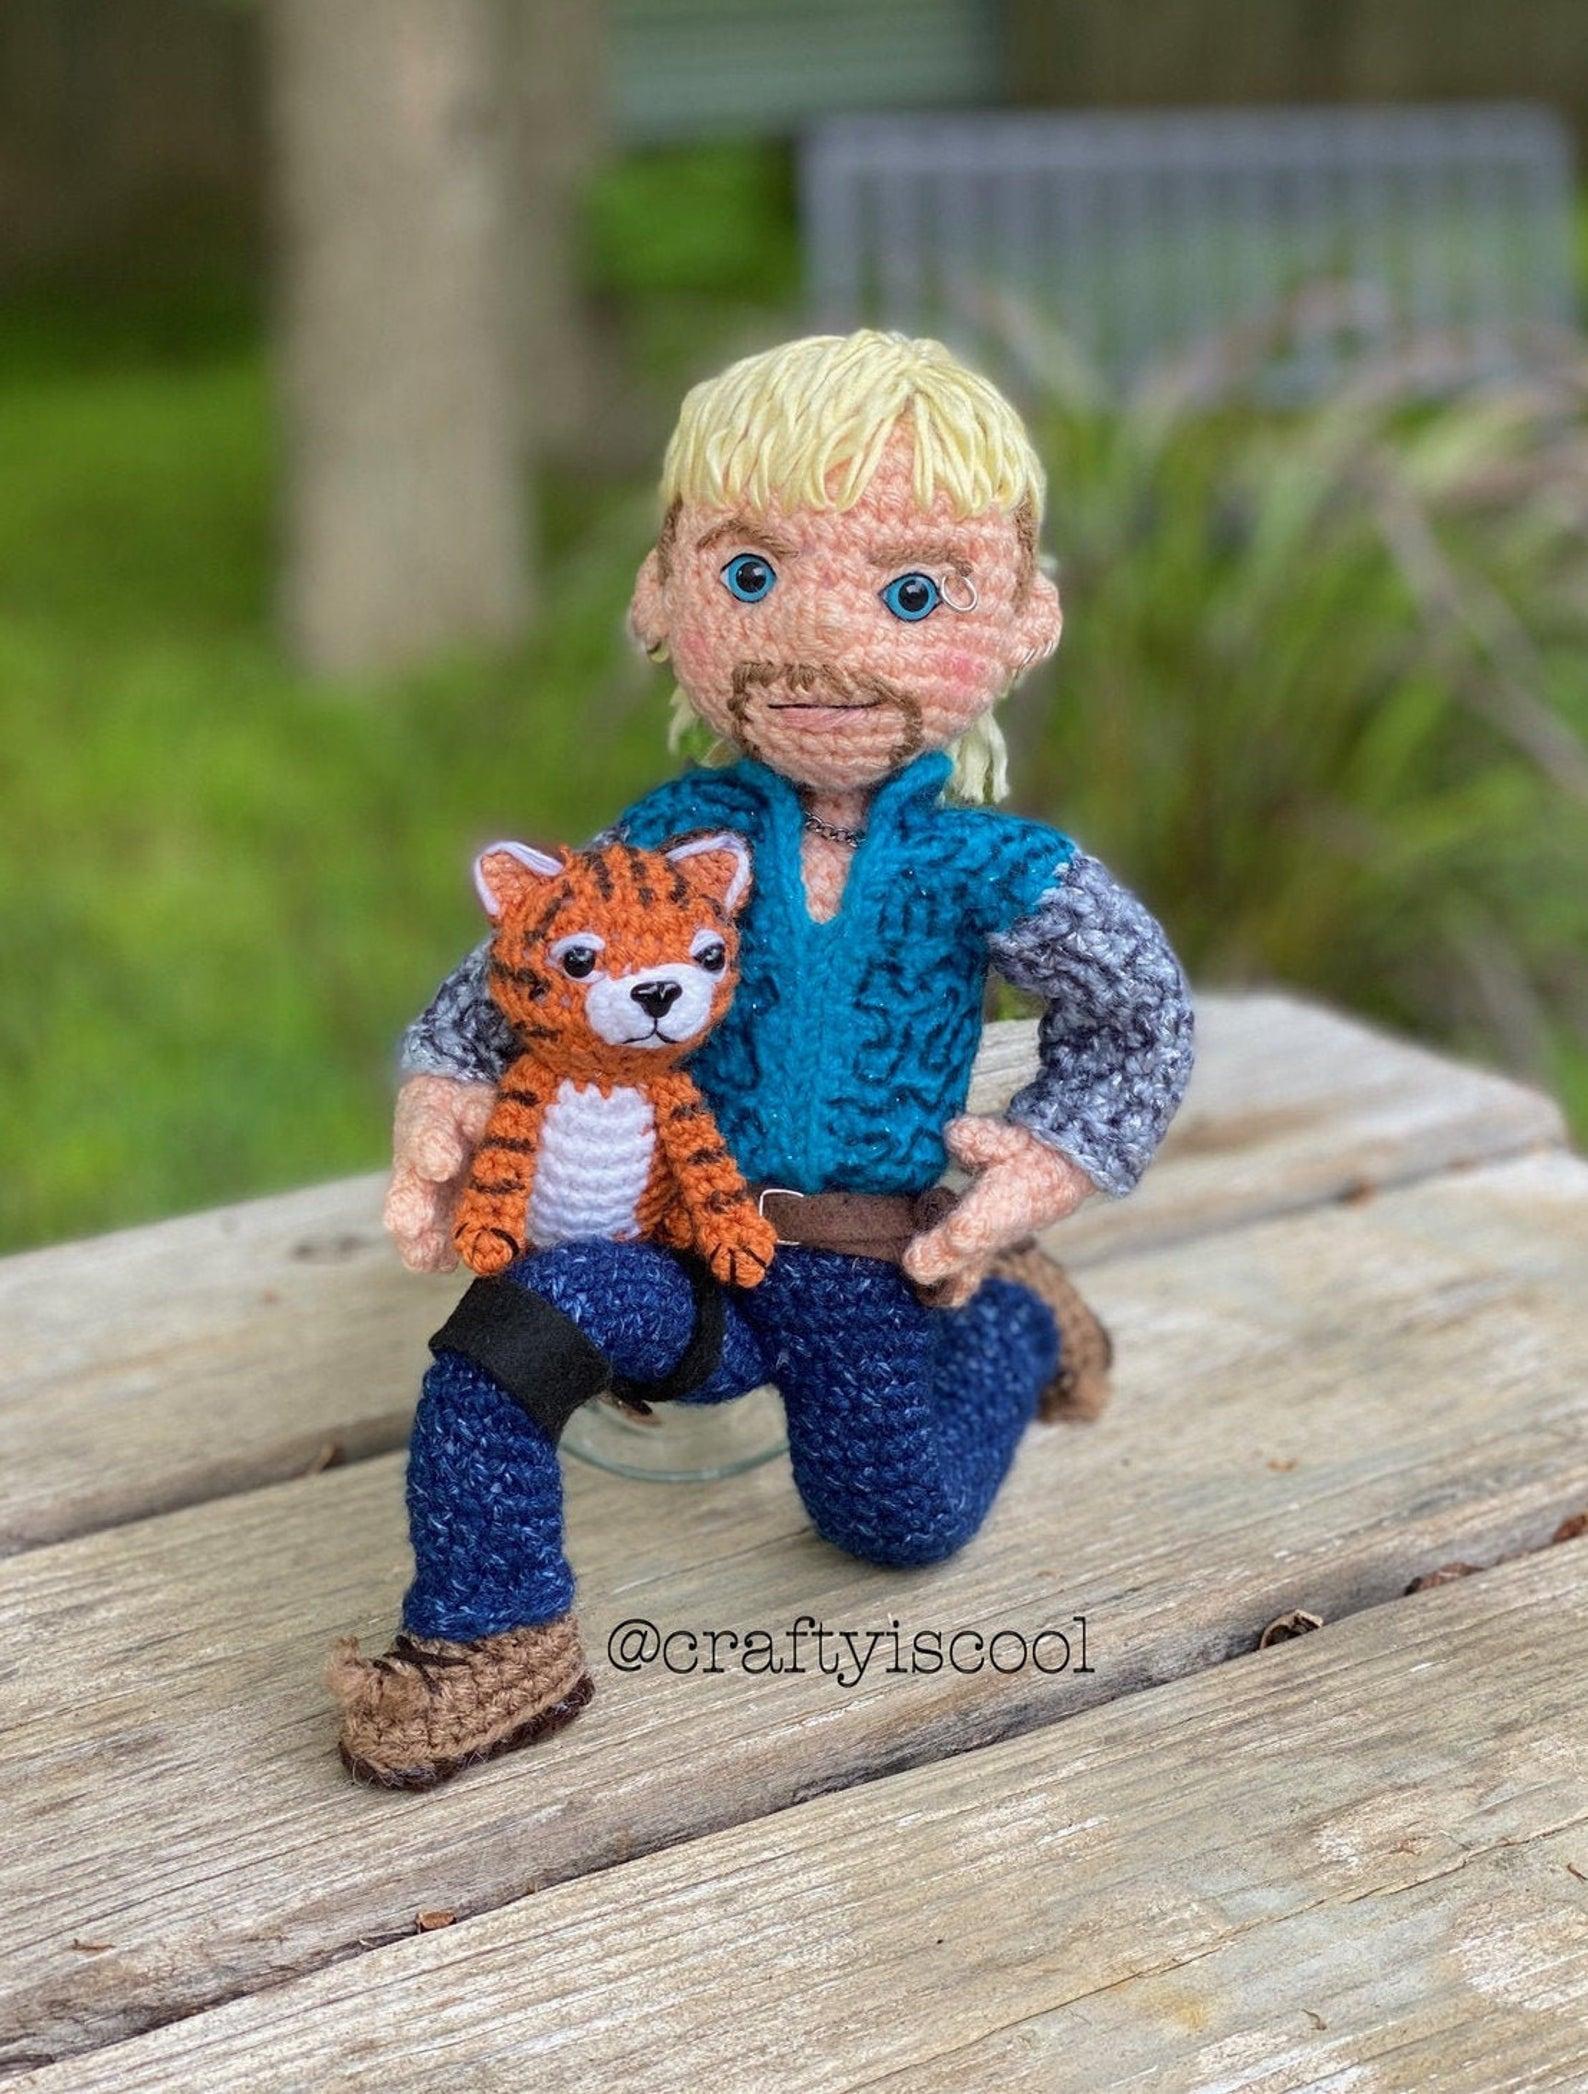 Classic Miffy Amigurumi Crochet Kit - Stitch & Story | 2094x1588